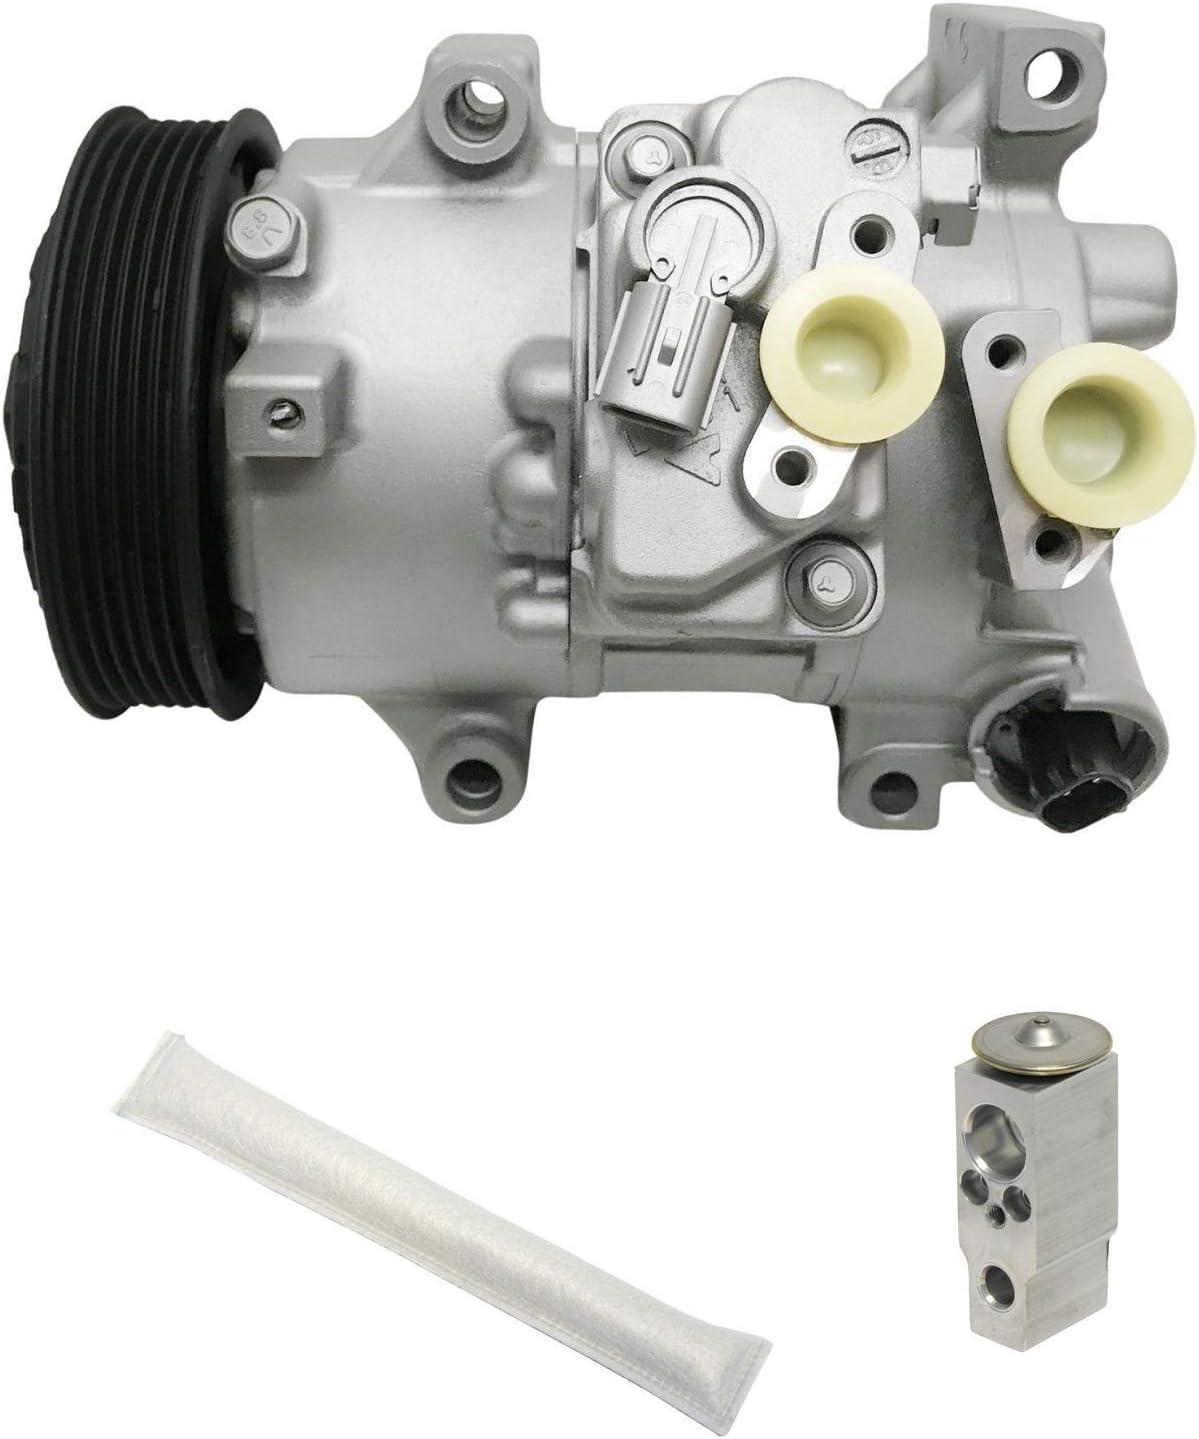 RYC Remanufactured AC Compressor Kit KT EA39